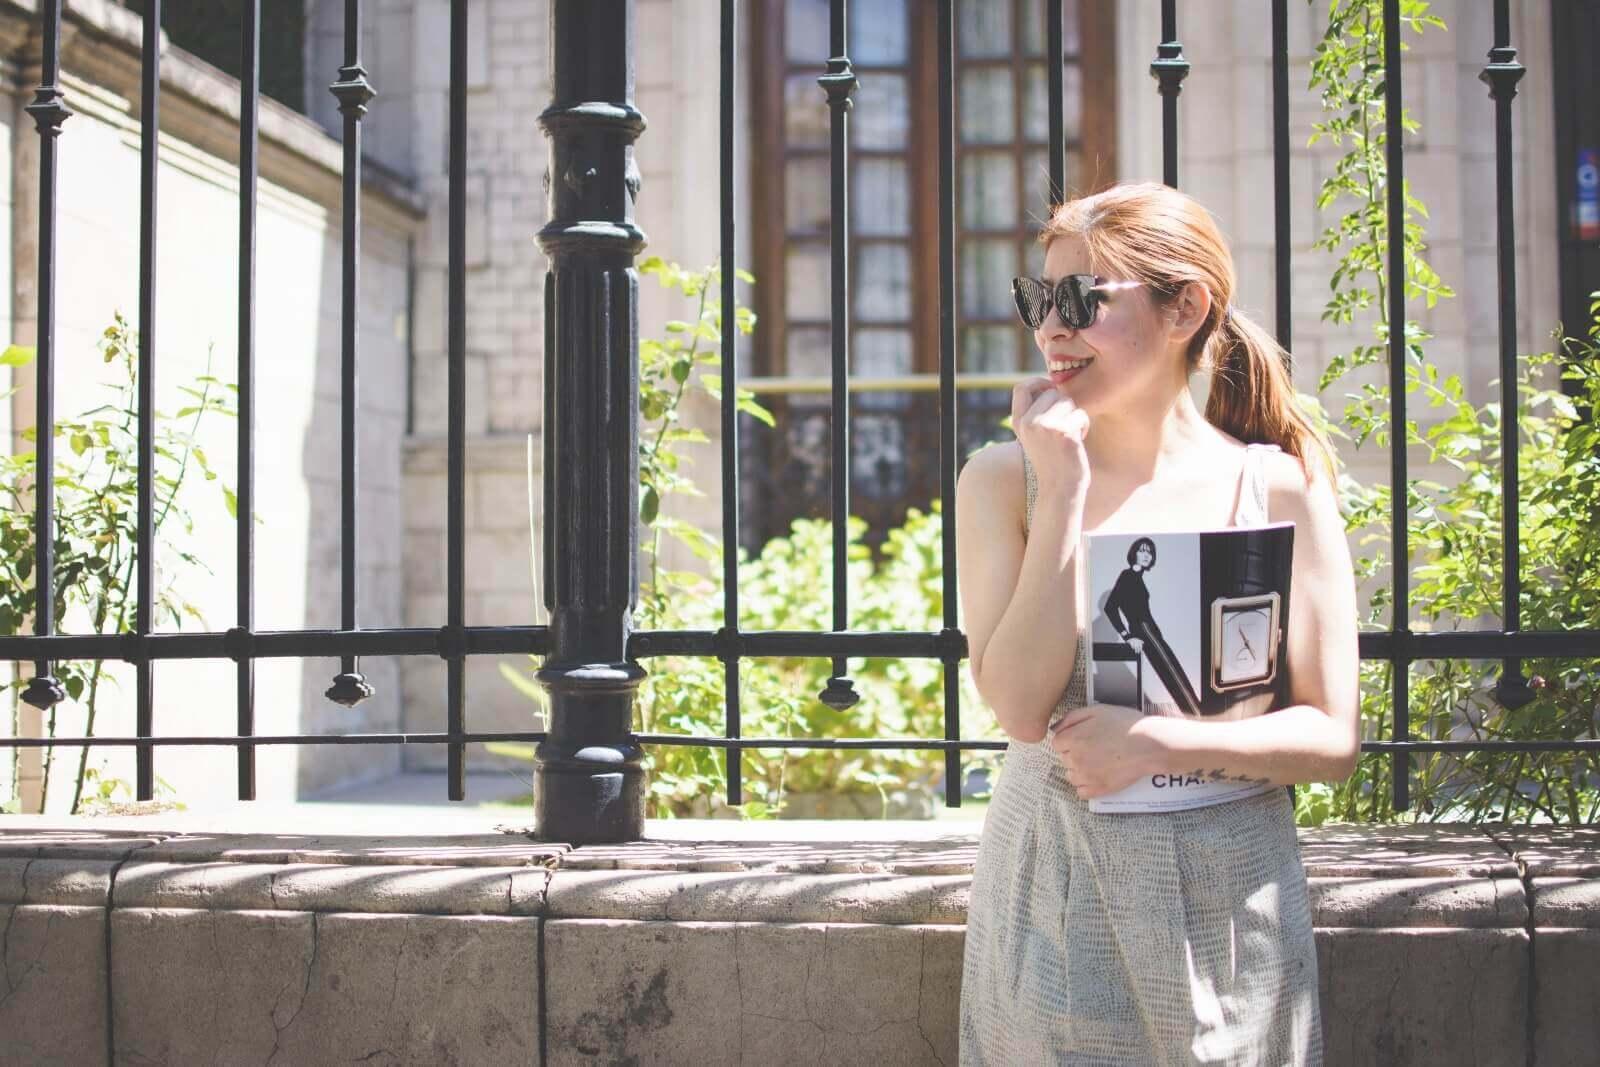 almond-white-dress-sammydress-stilettos-valentino-rockstud-imitation-deborah-ferrero-style-by-deb-ladylike04